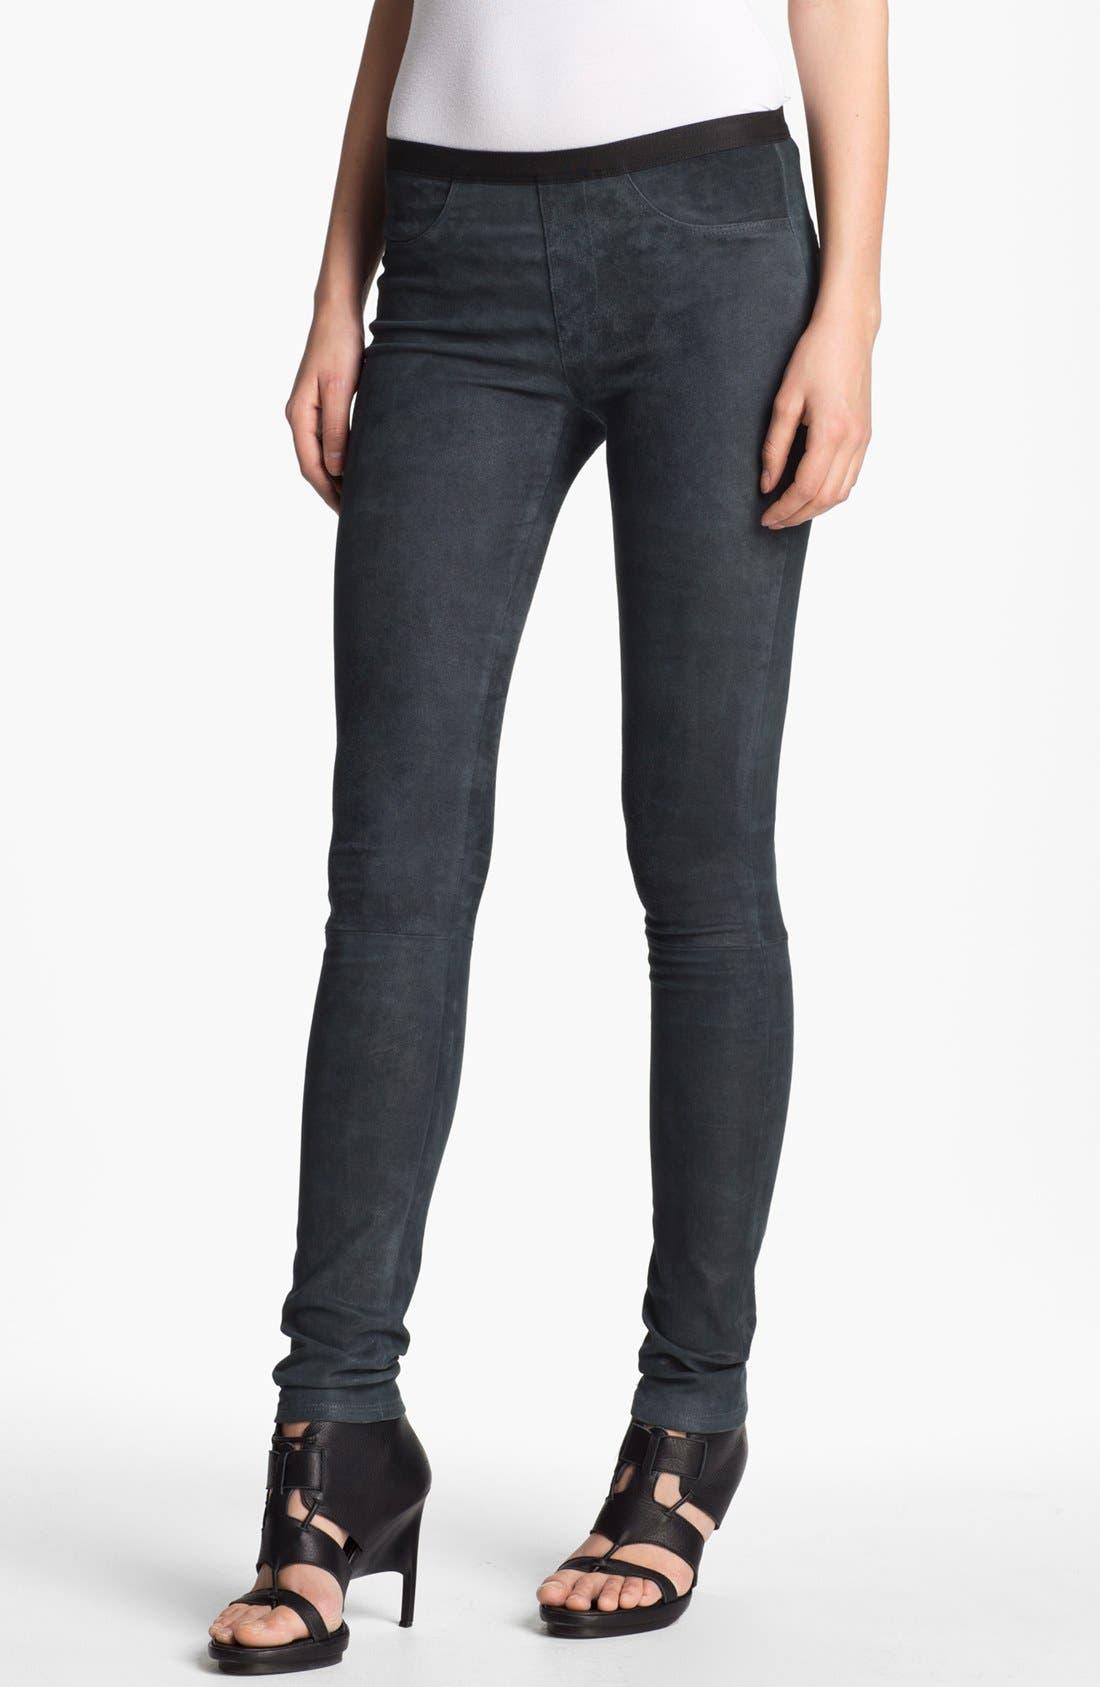 Alternate Image 1 Selected - Helmut Lang Patina Leather Leggings